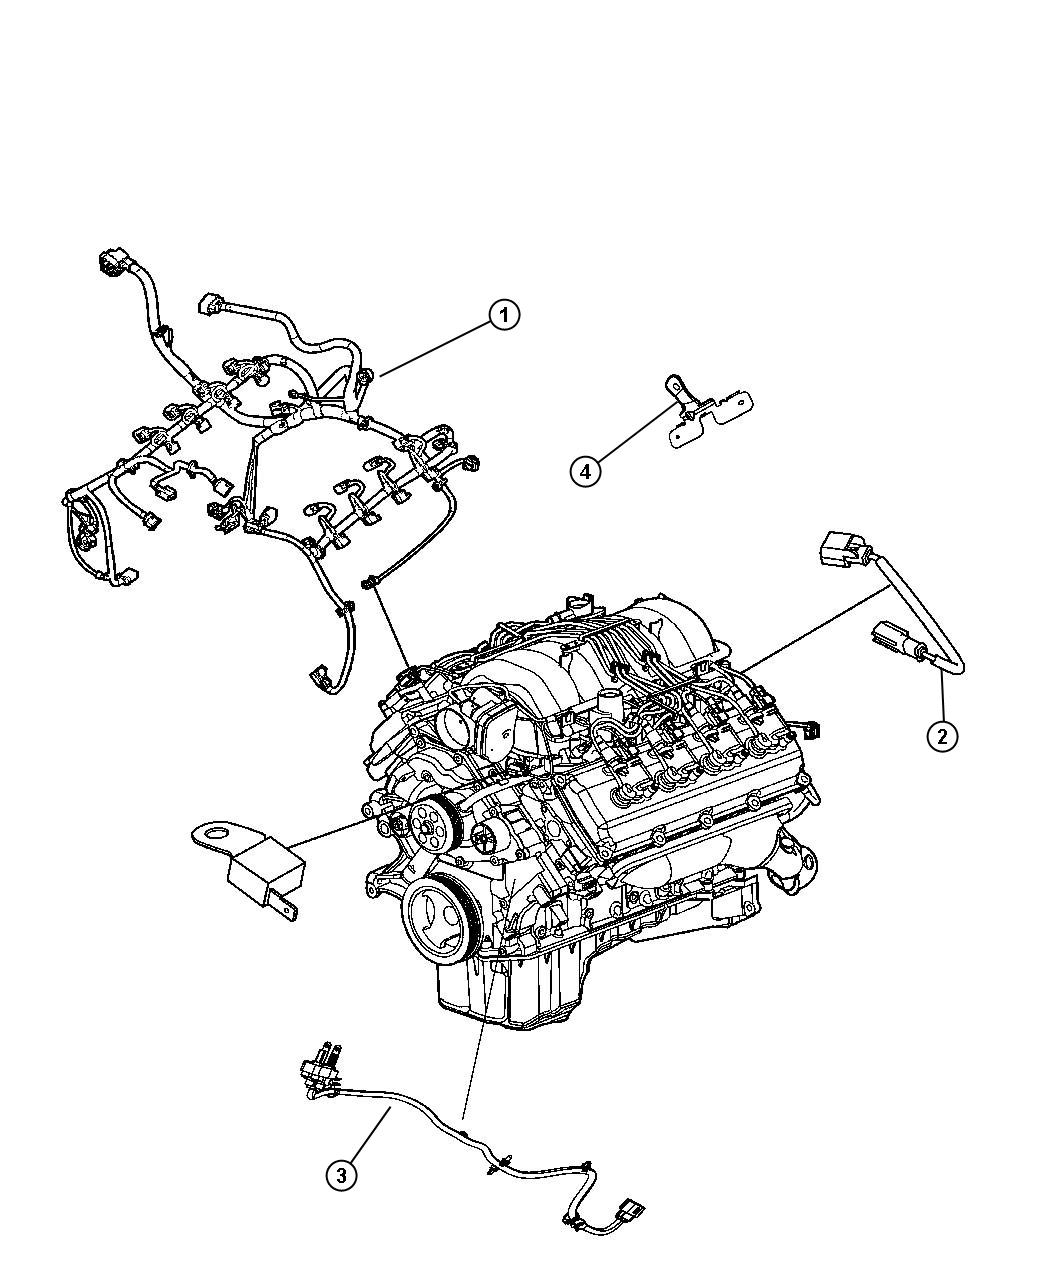 Dodge Ram Wiring Engine Elec Shift On Demand